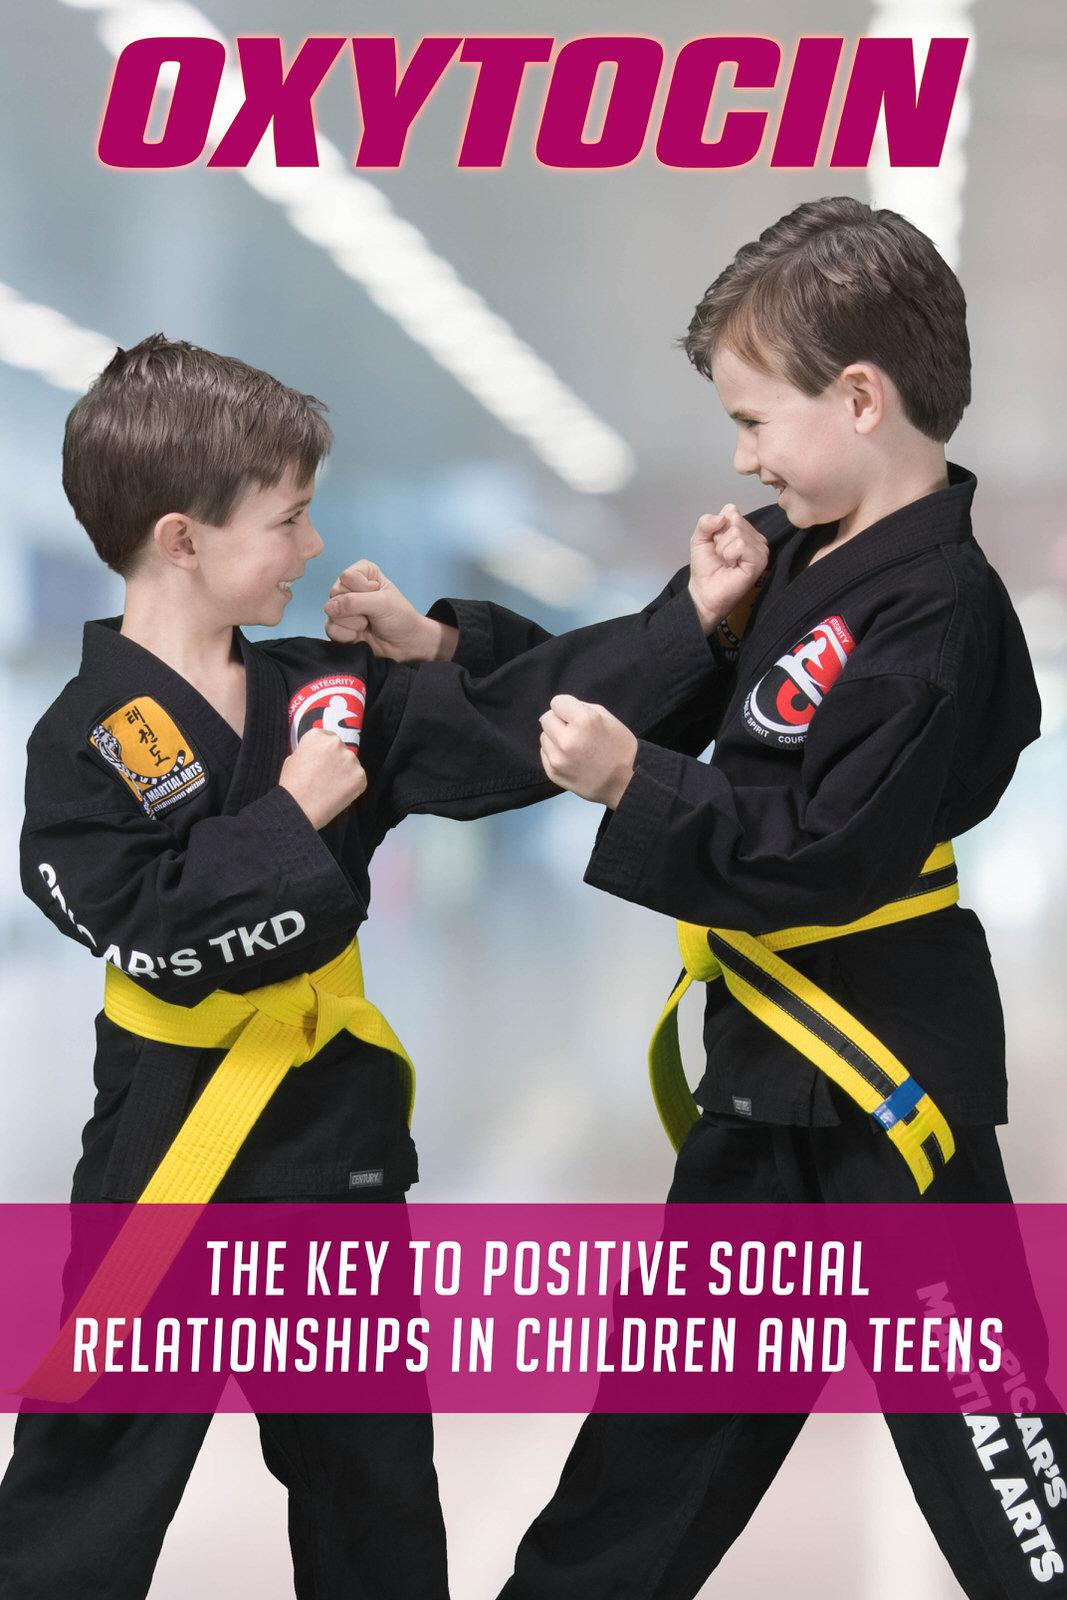 oxytocin-in-children-spicars-martial-arts.jpg